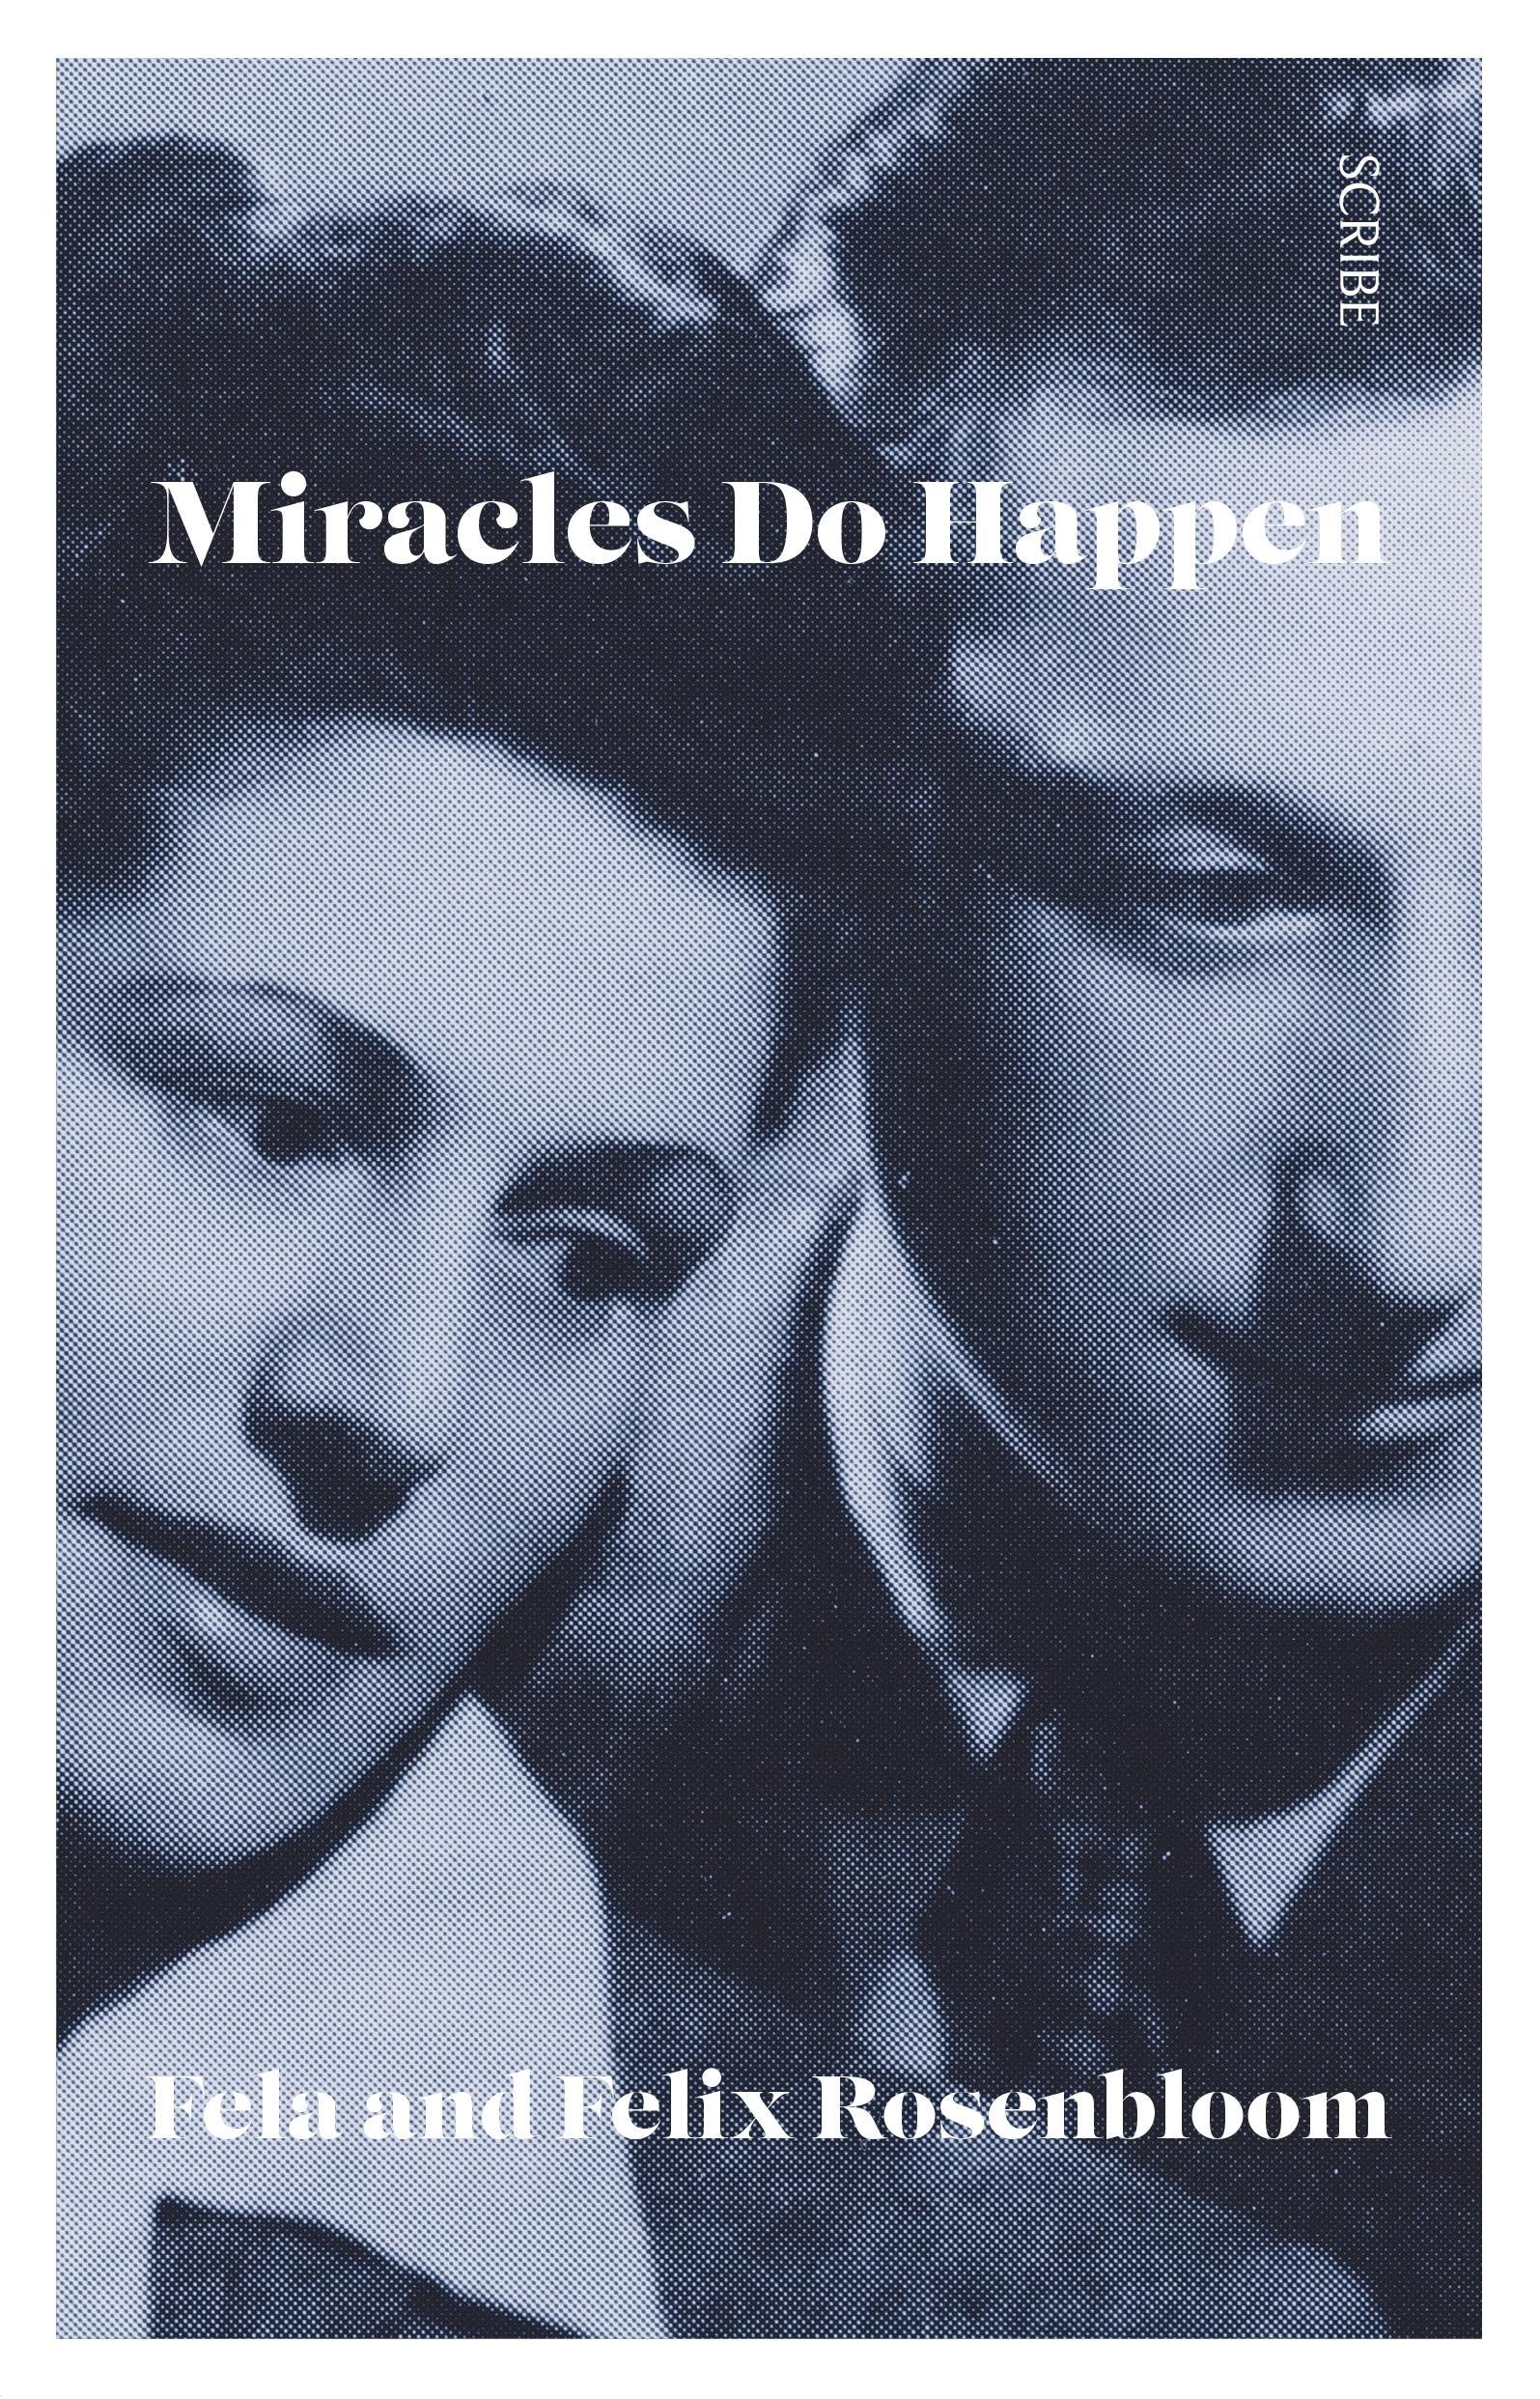 MiraclesDoHappen